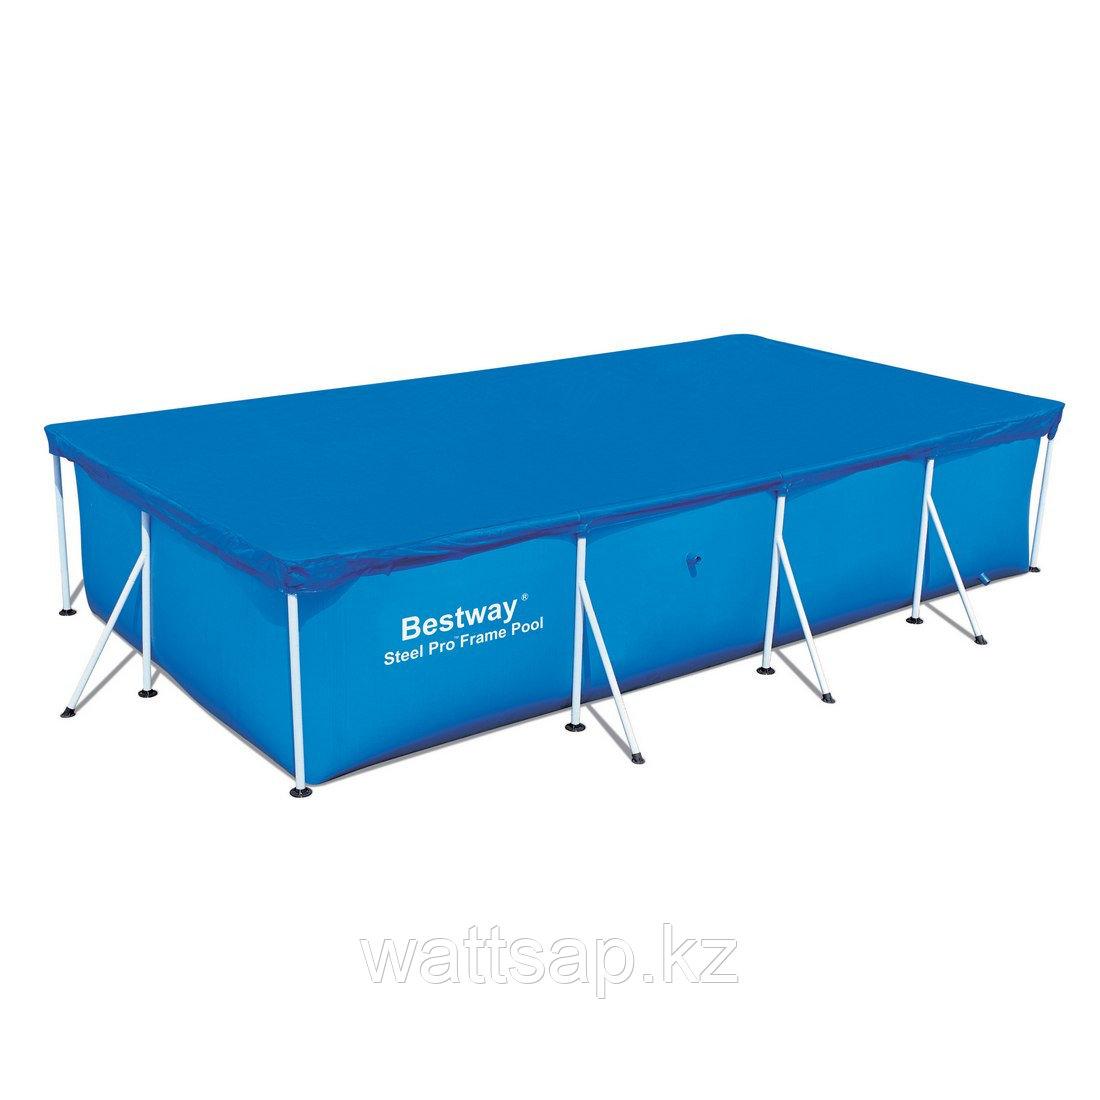 Тент для бассейна, BESTWAY, 58107, 400х211х81 см, Полиэтилен, Шнуры для крепления, Синий, Цветная коробка